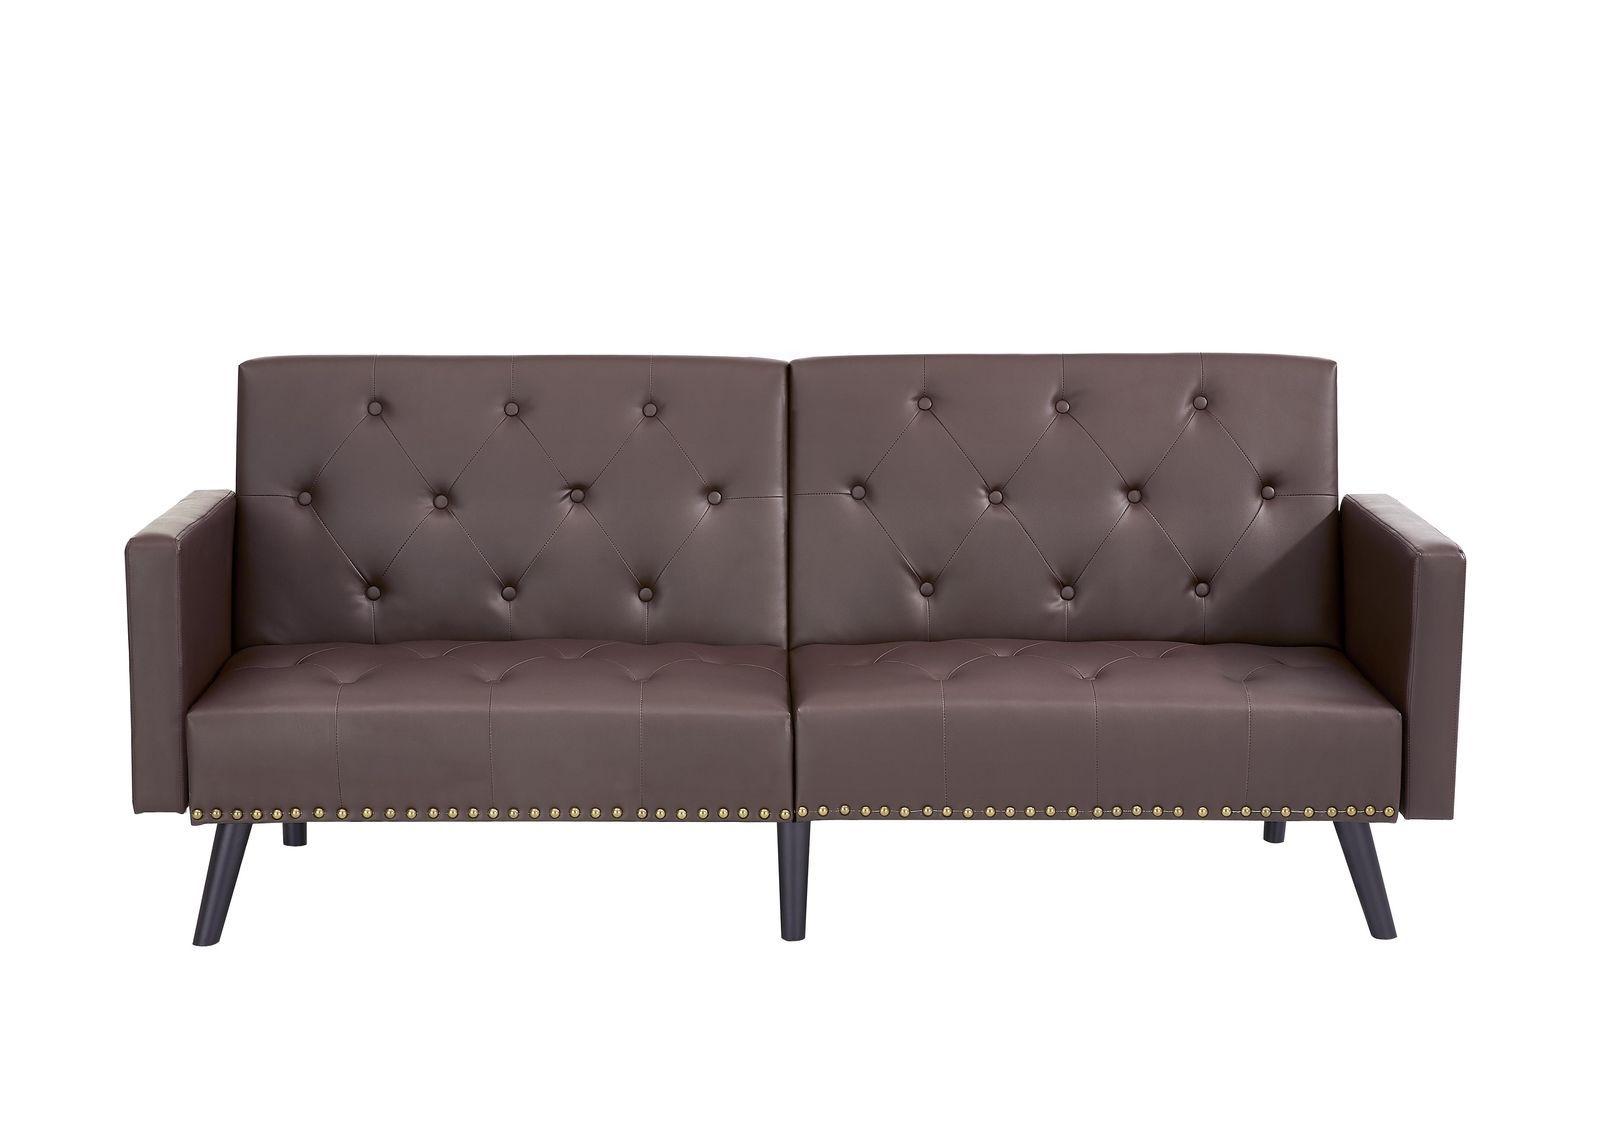 huge discount 42d47 2db4b 199.99 | Naomi Home Convertible Tufted Split Back Futon Sofa ...